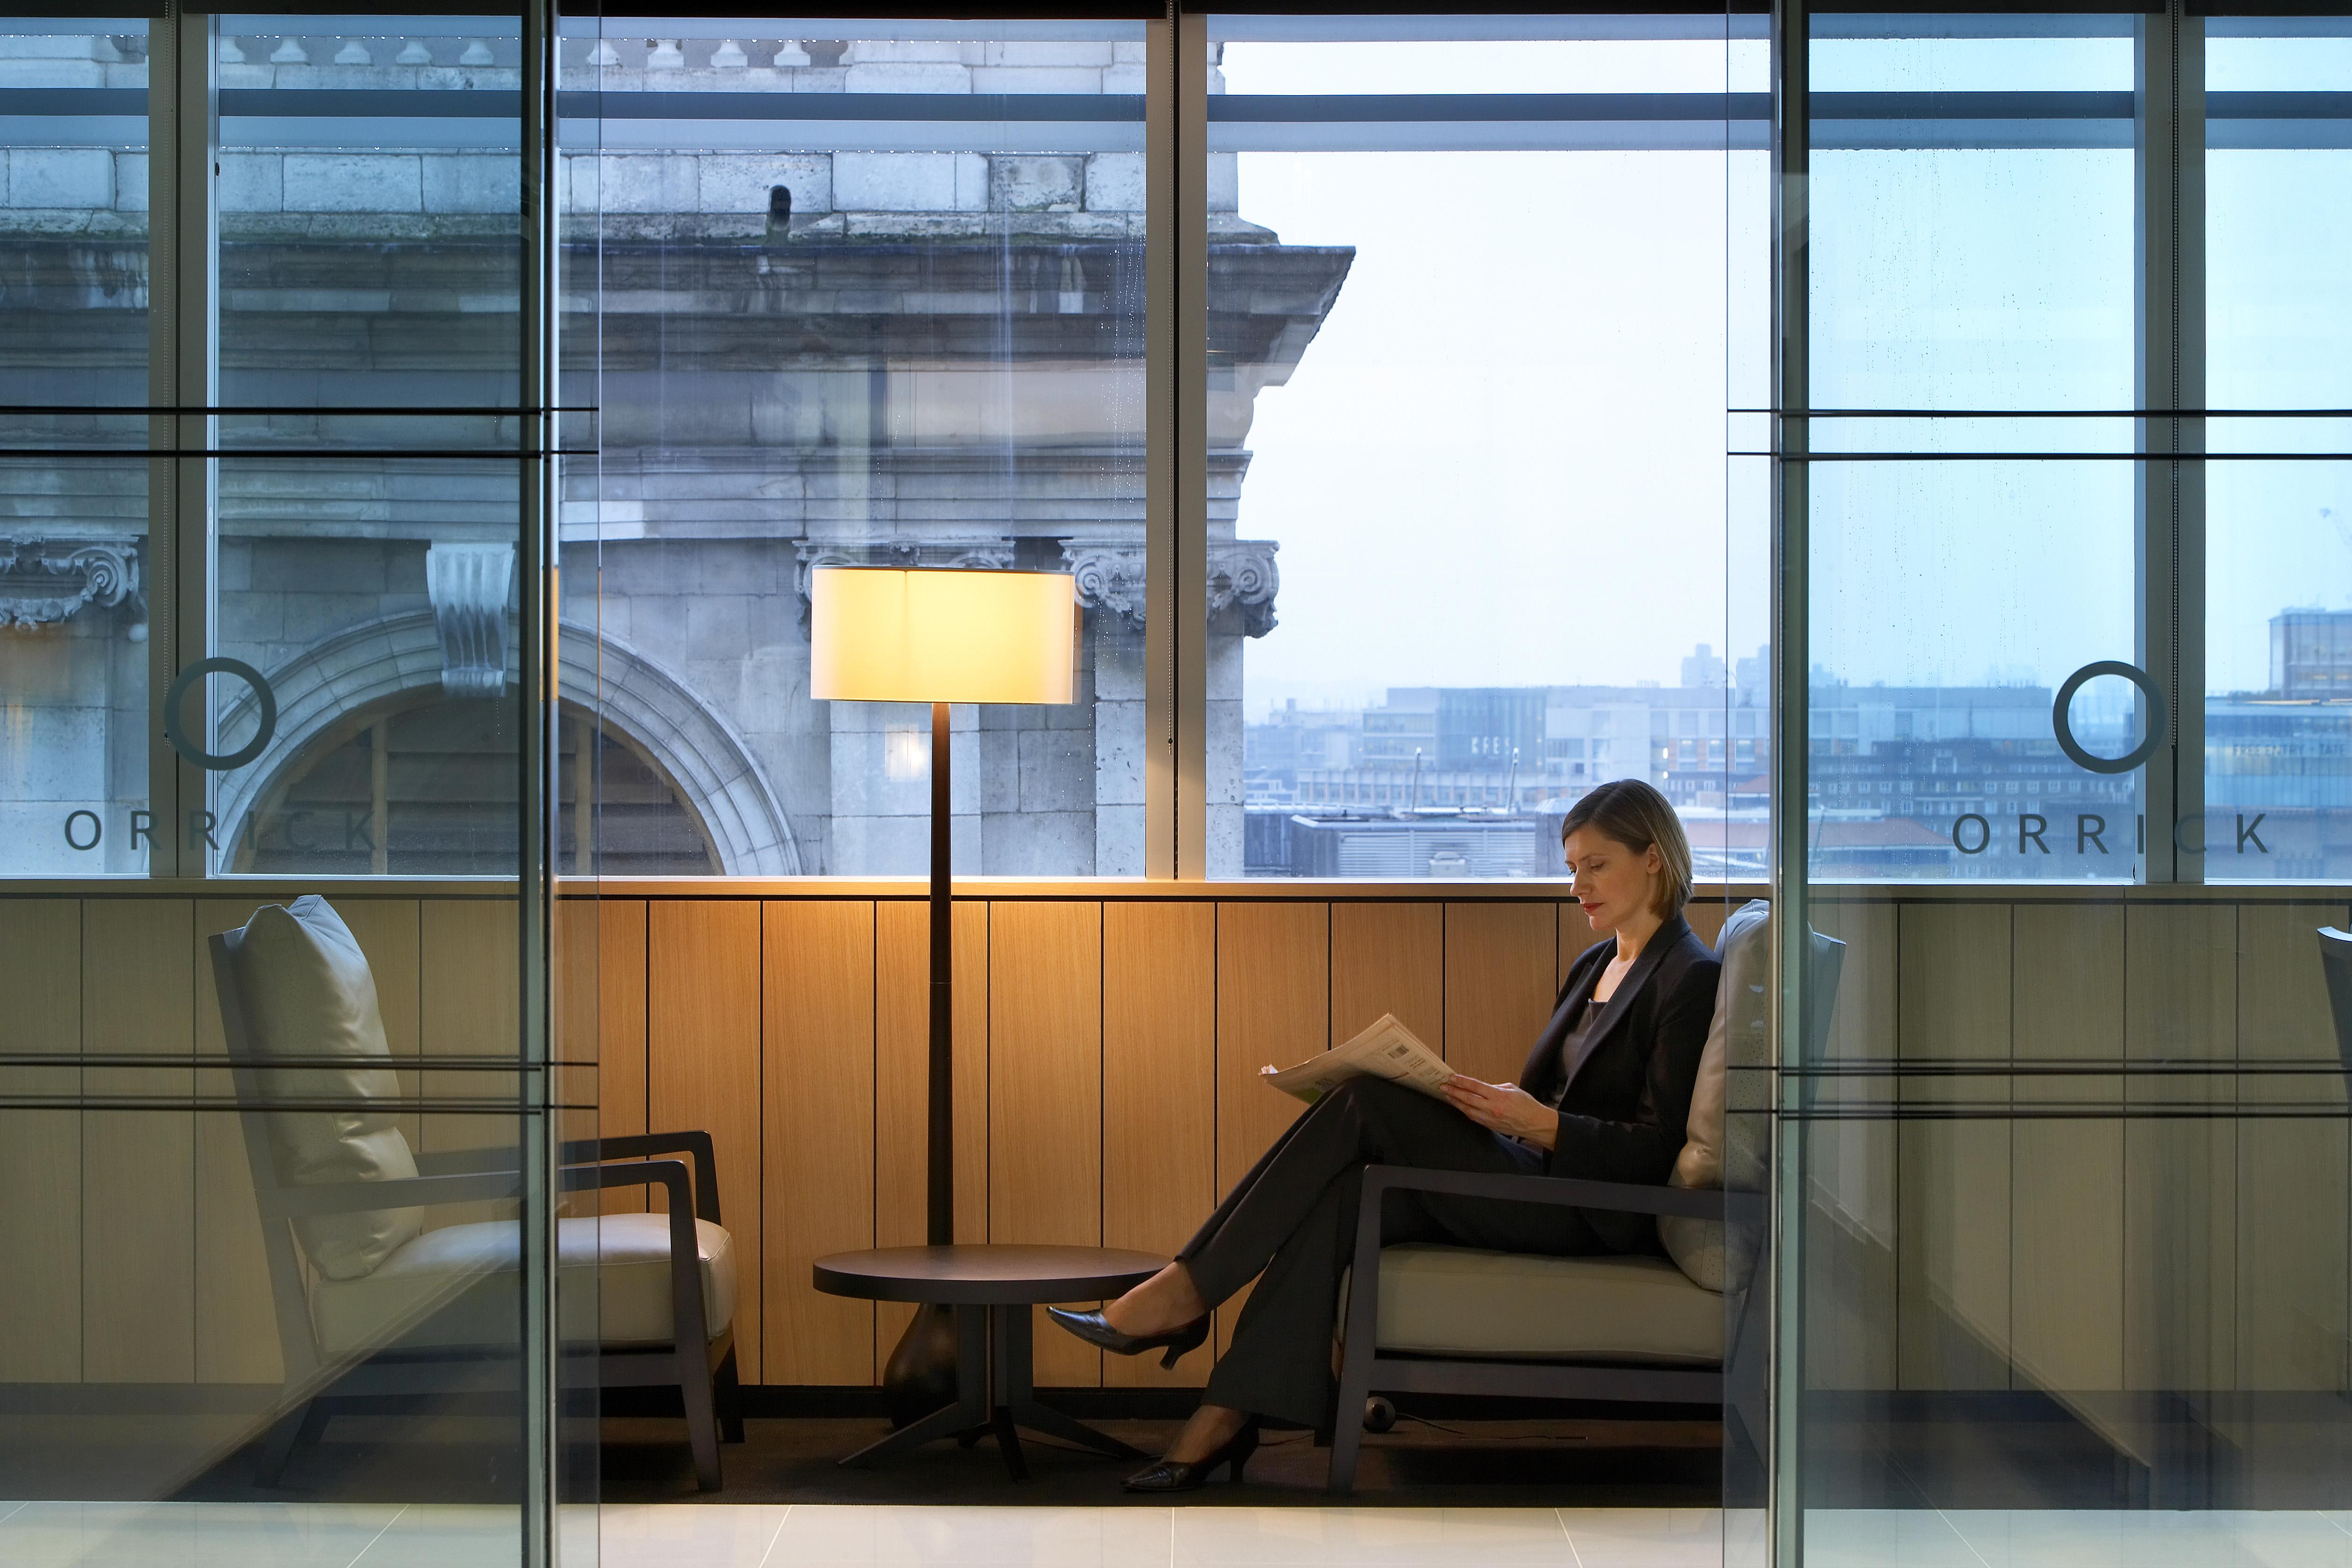 OrrickLondonUnited Kingdom Architect:  Tp Bennett 2009 Orrick, Herrington & Sutcliffe, Tp Bennett, London, Uk, 2009 Interior Shot Showing A Woman Reading In A Relaxing Seated Area